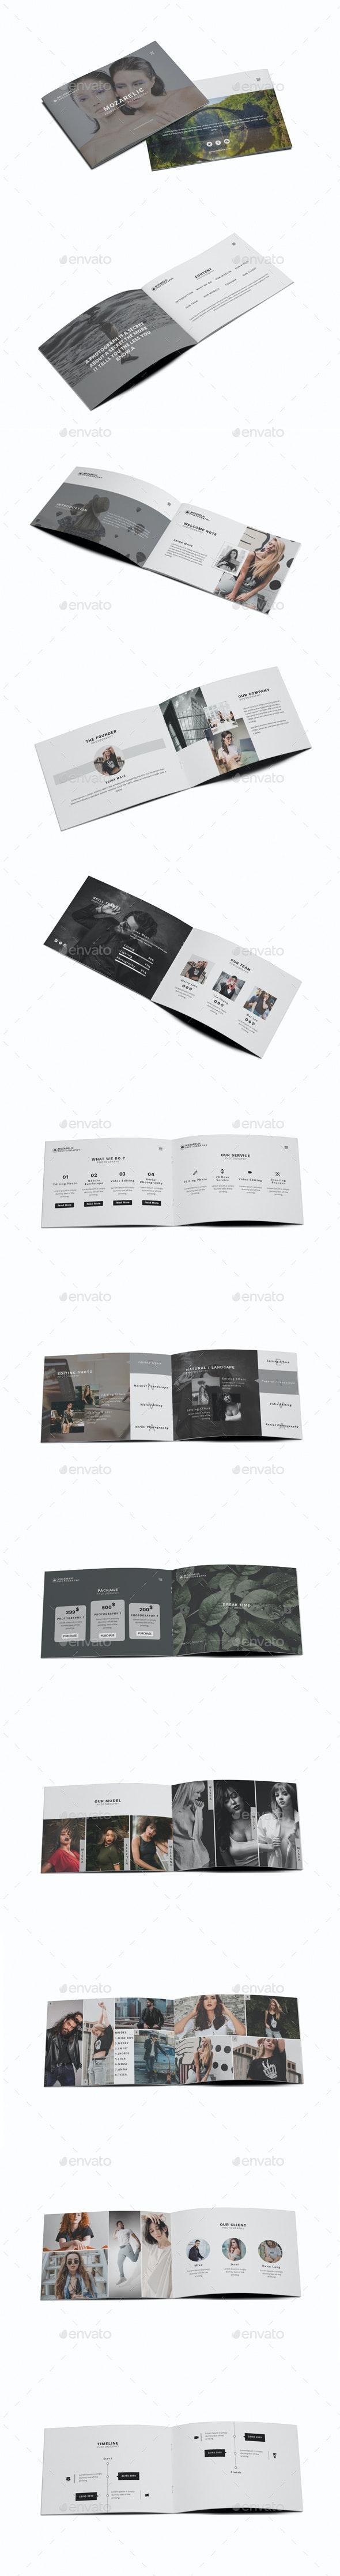 Mozarelic Photography A5 Brochure - Brochures Print Templates